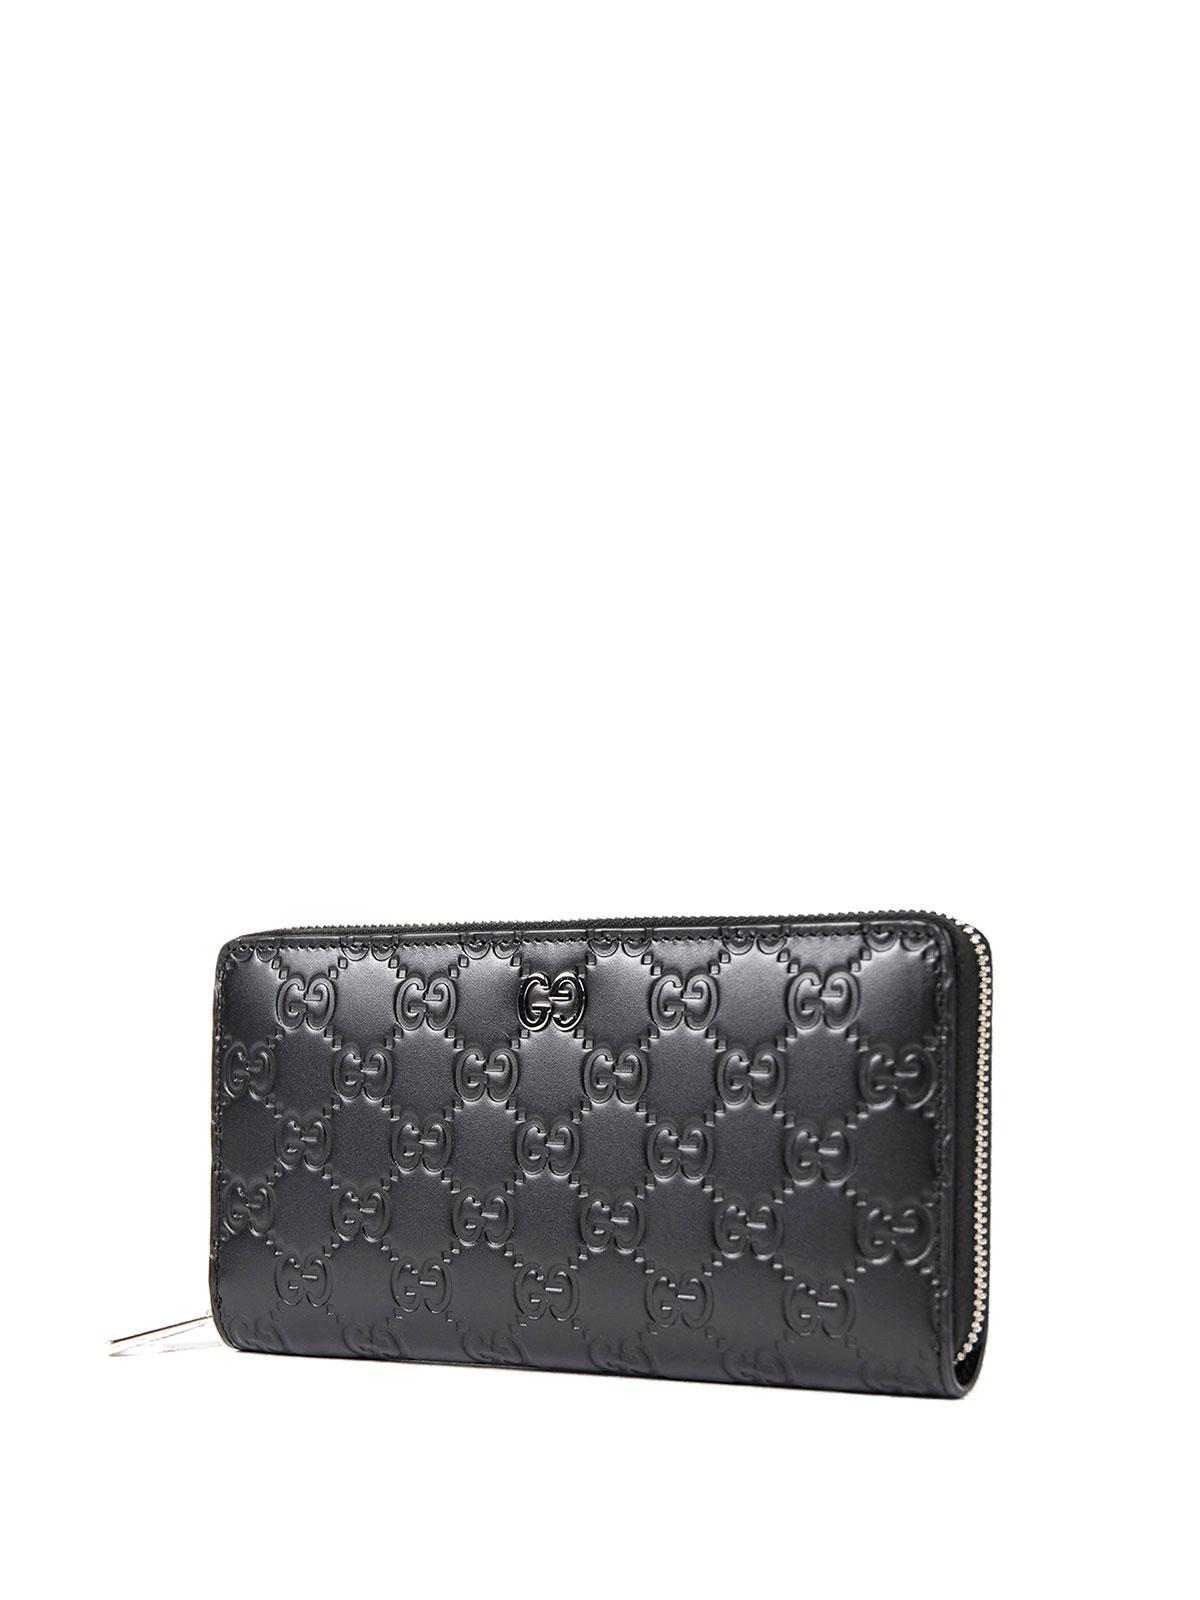 6c6de85c4663 GUCCI: wallets & purses online - Gucci Signature zip-around wallet